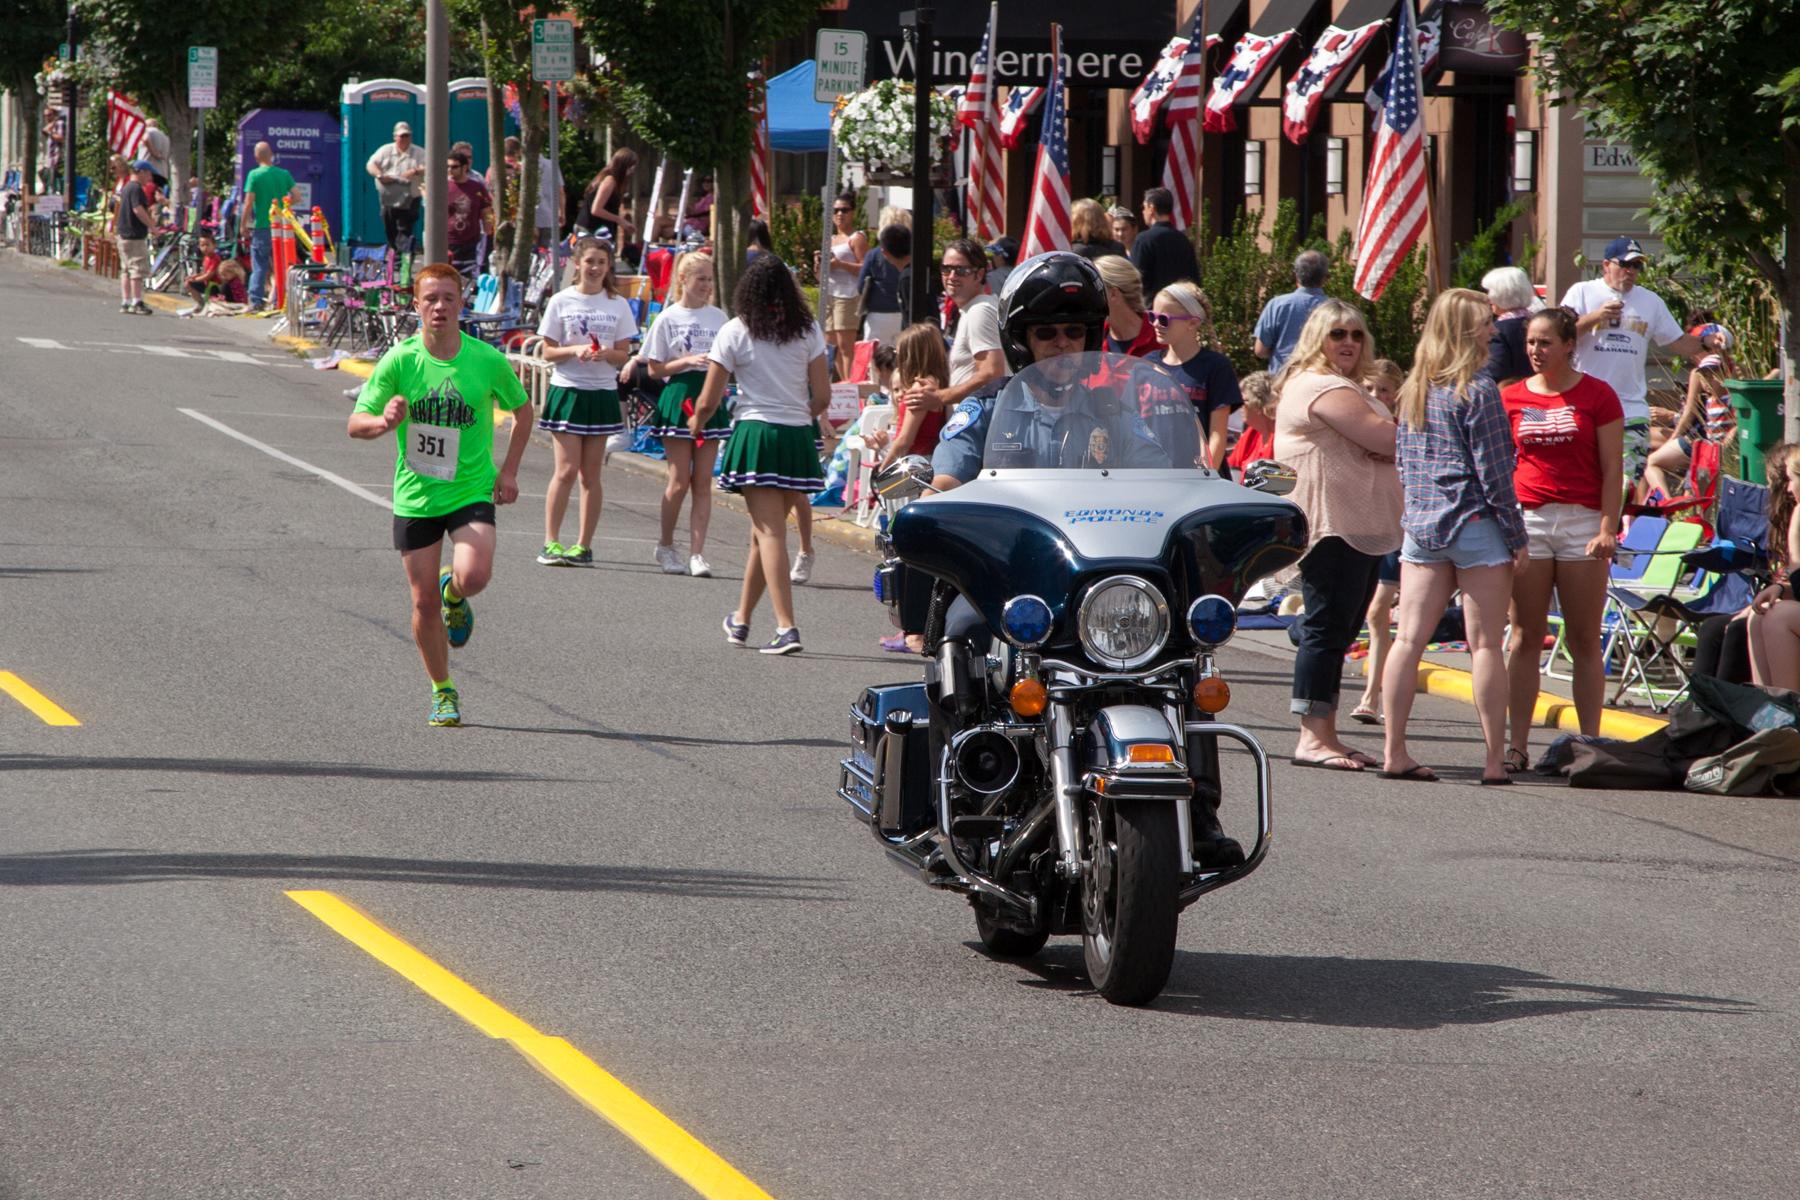 2014 - 5K 4th of July Run-9569